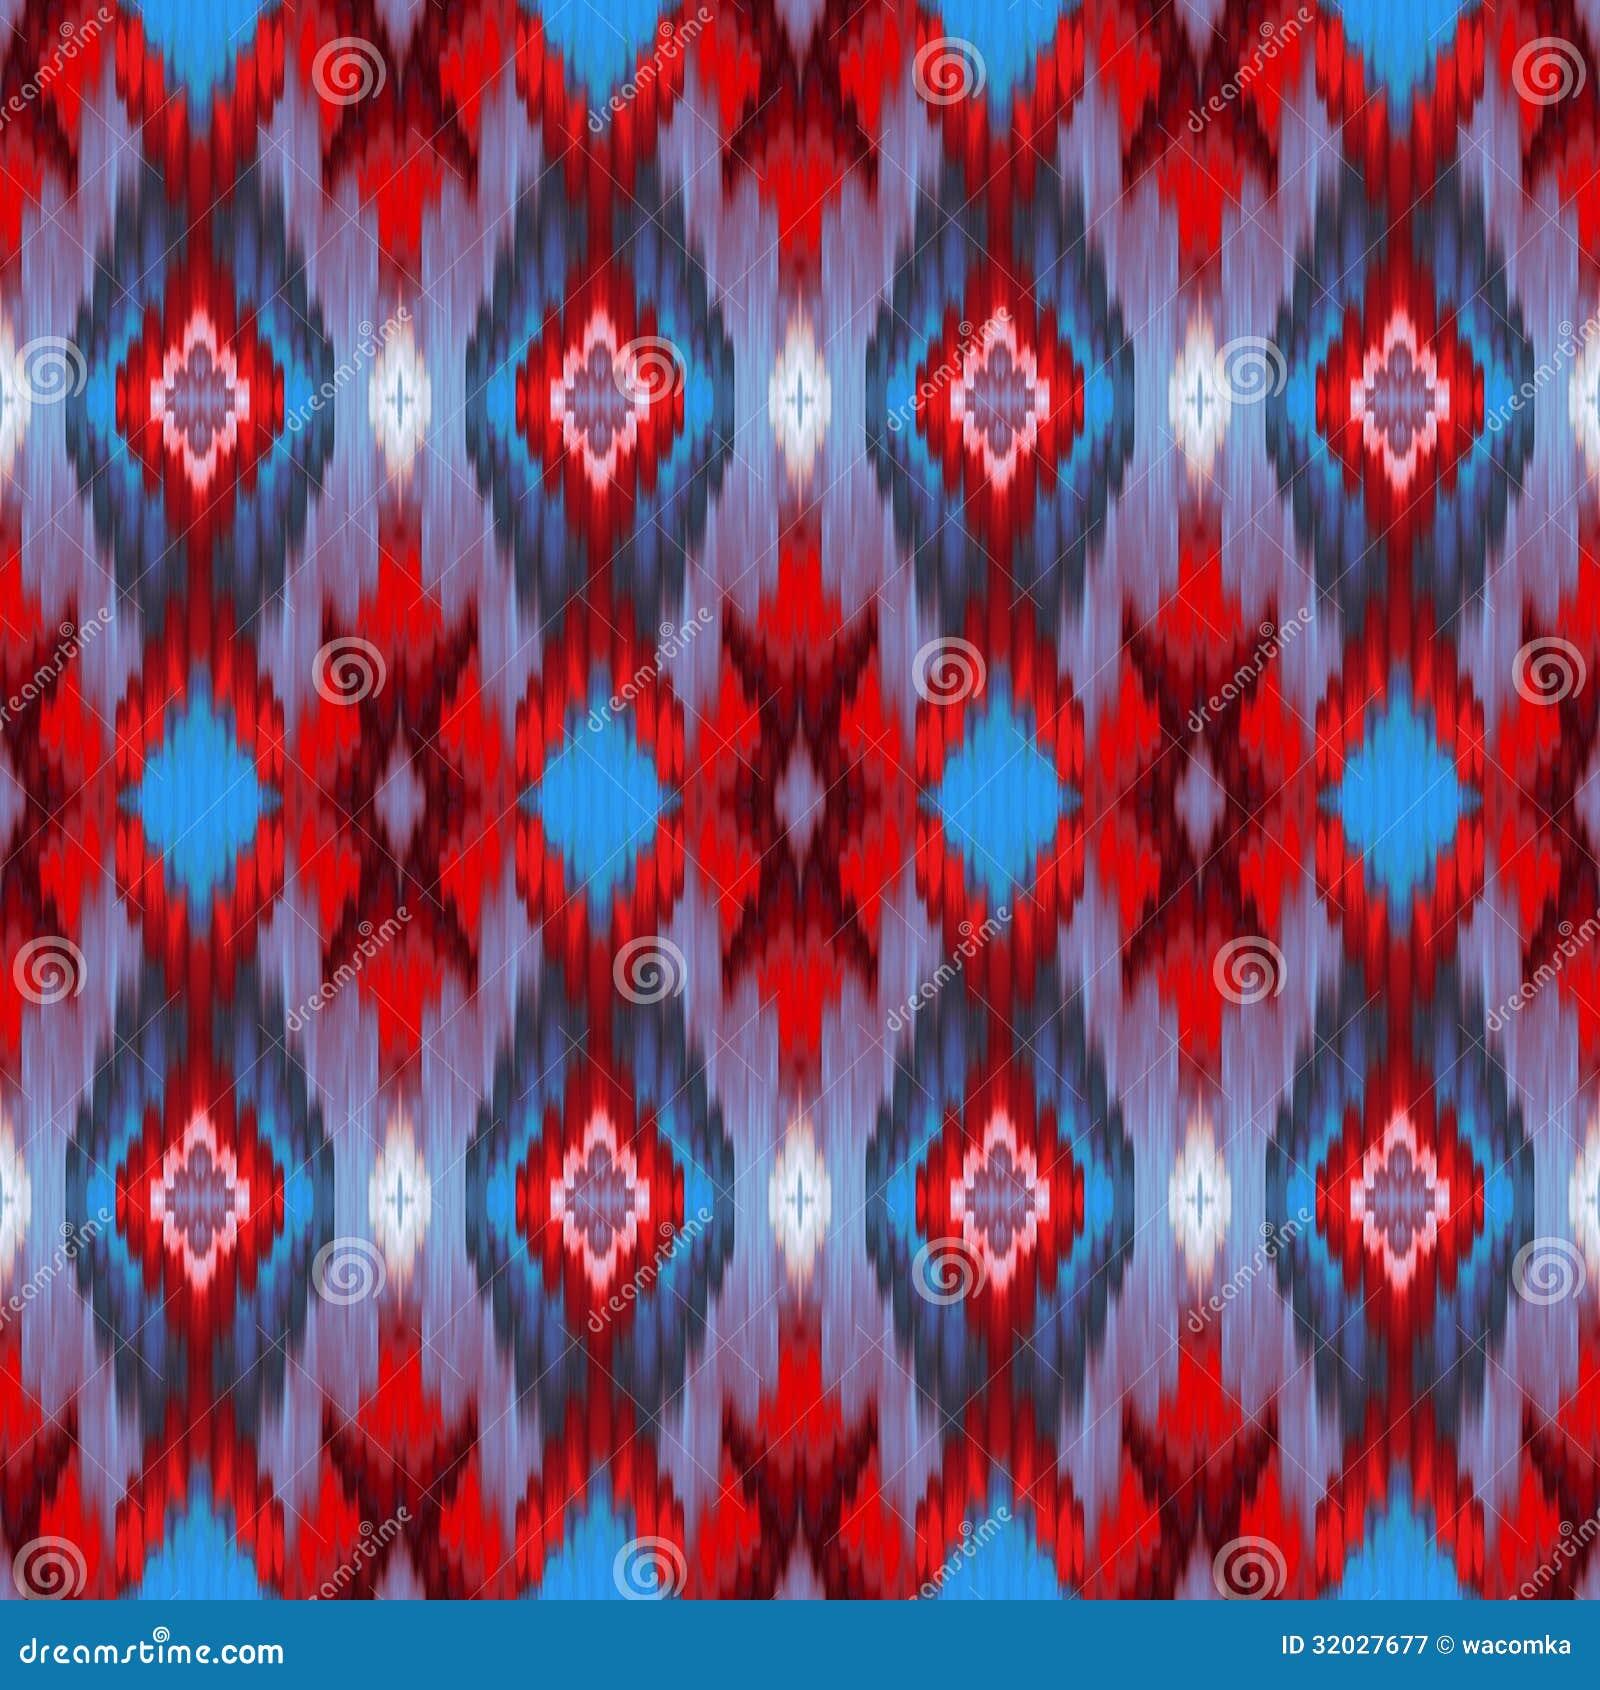 Seamless intricate ikat pattern background royalty free - Ikat muster ethno design ...